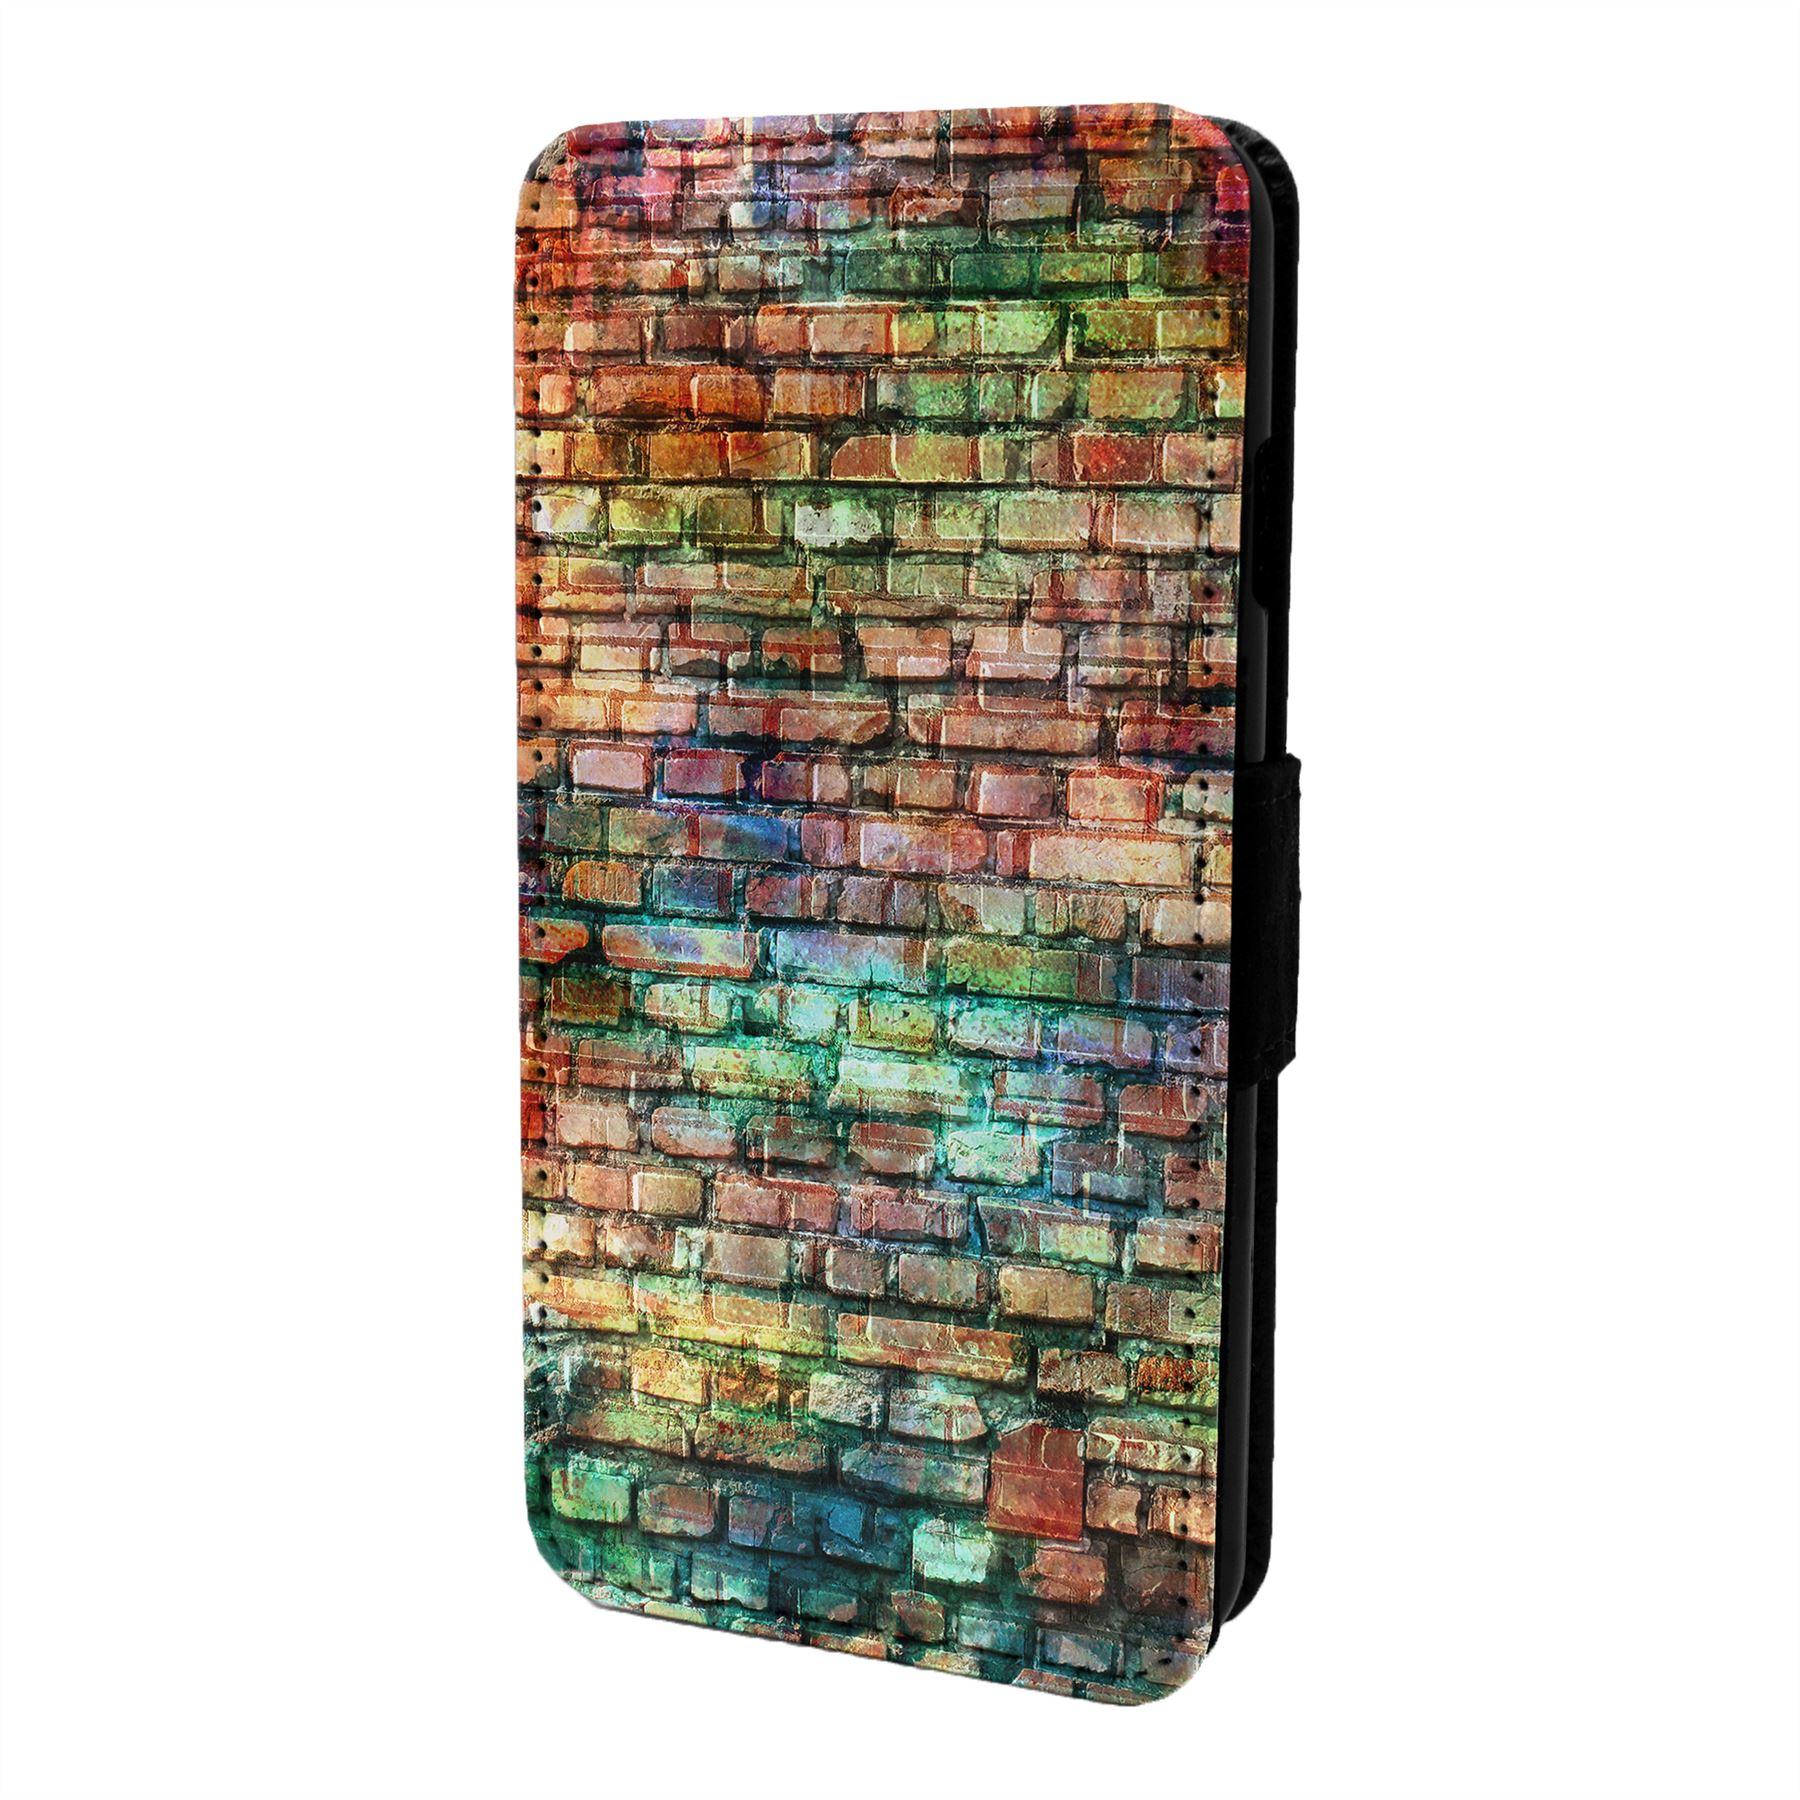 Graffiti-Art-Funda-Libro-para-Telefono-Movil-S6752